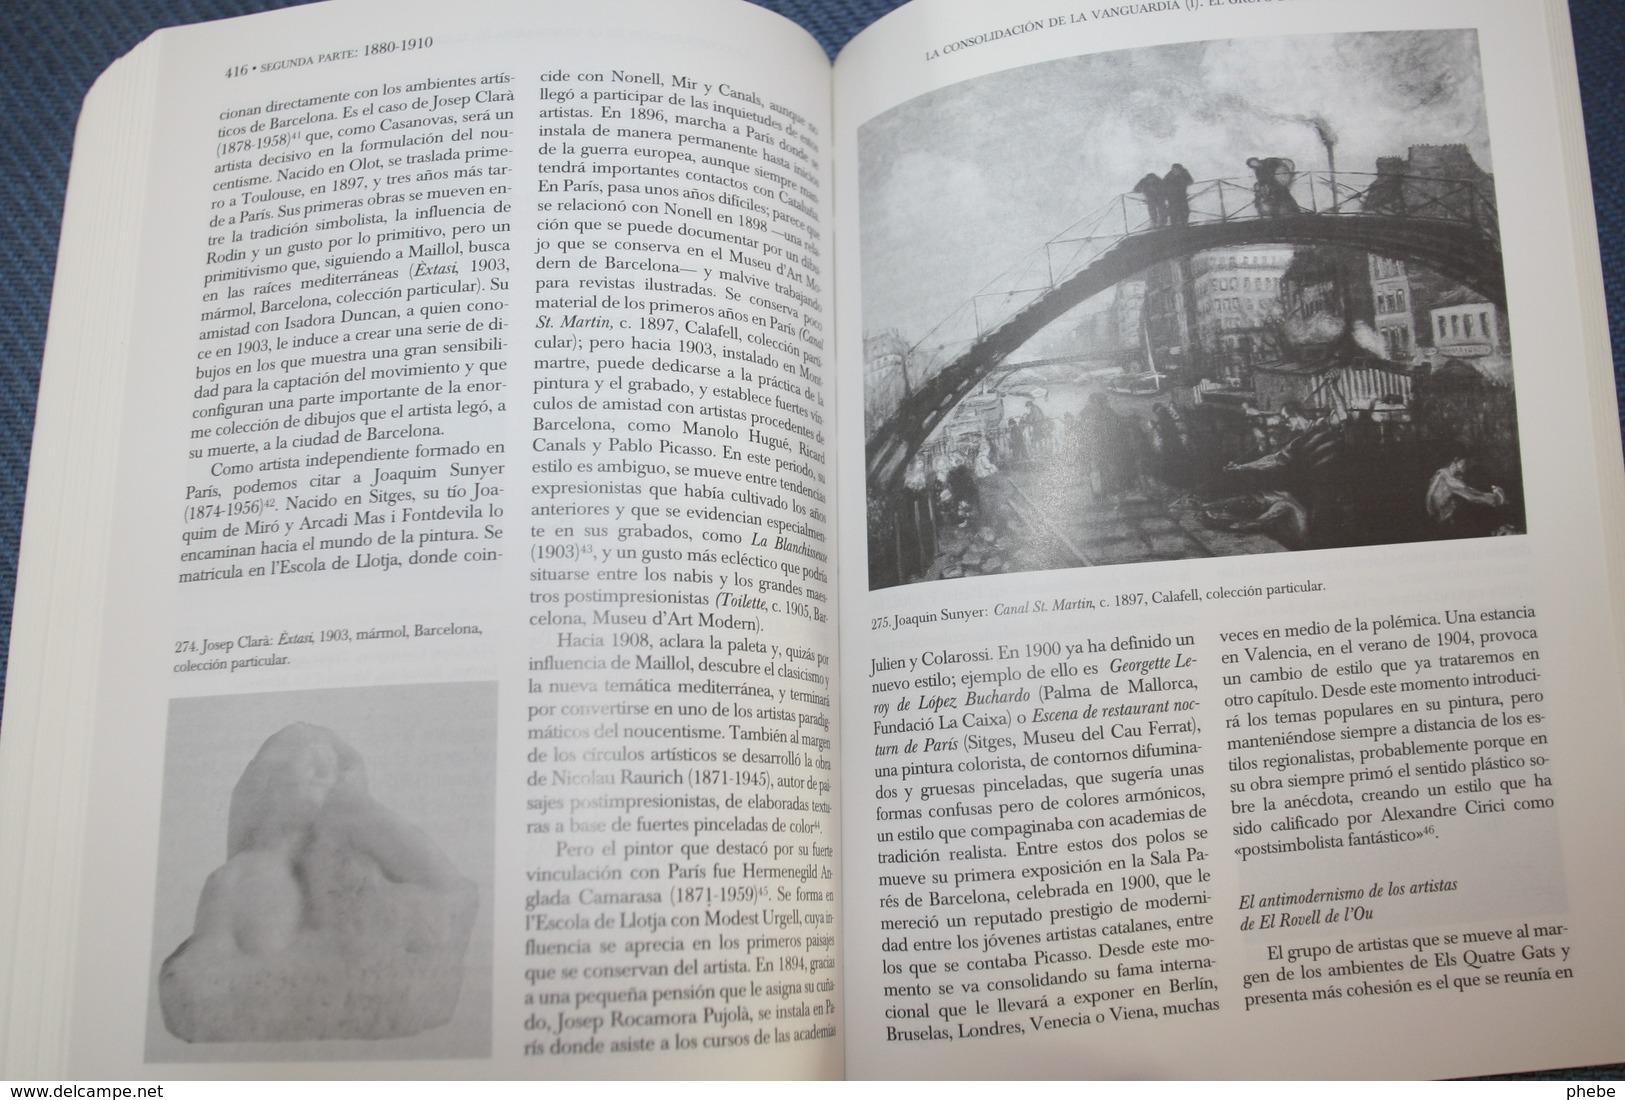 REYERO FREIXA / Pintura Y Escultura En Espana 1800-1910 - Culture